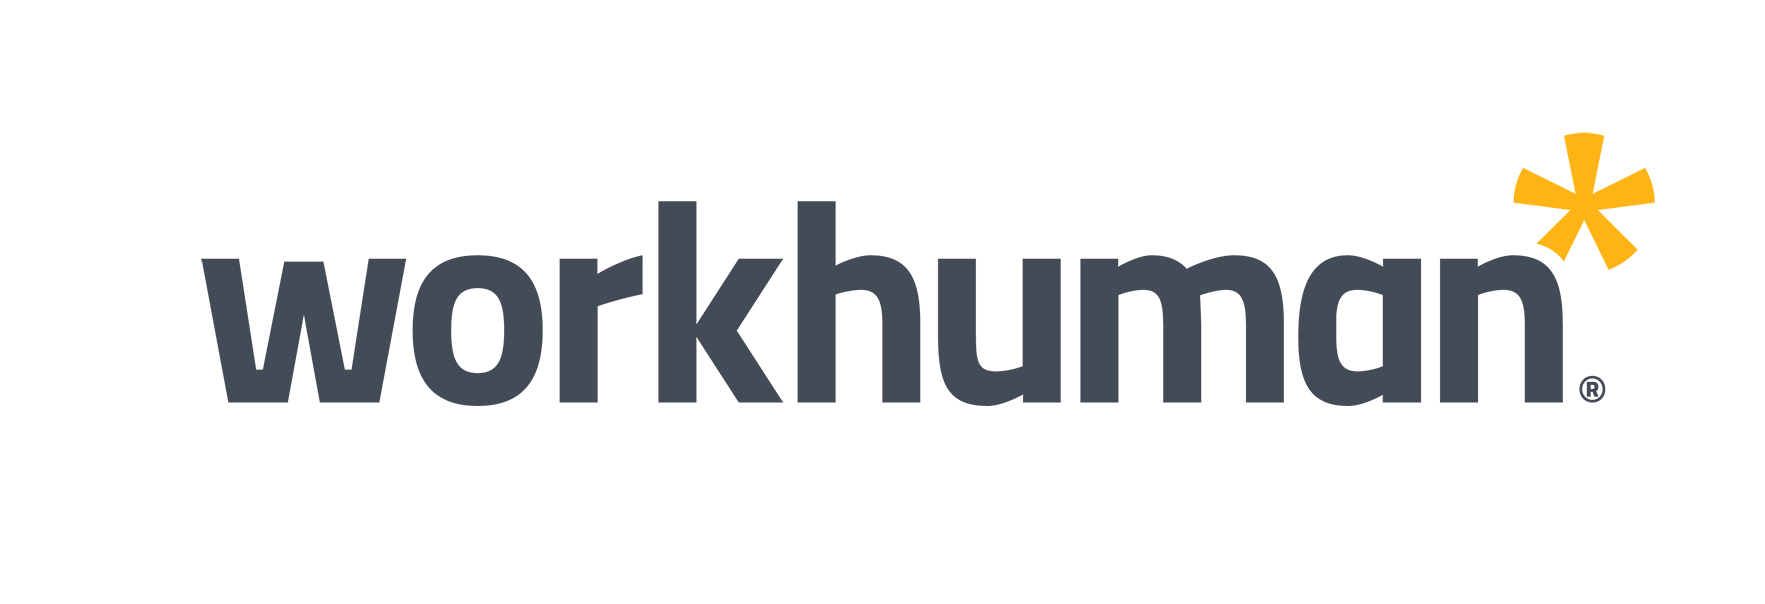 Work Human